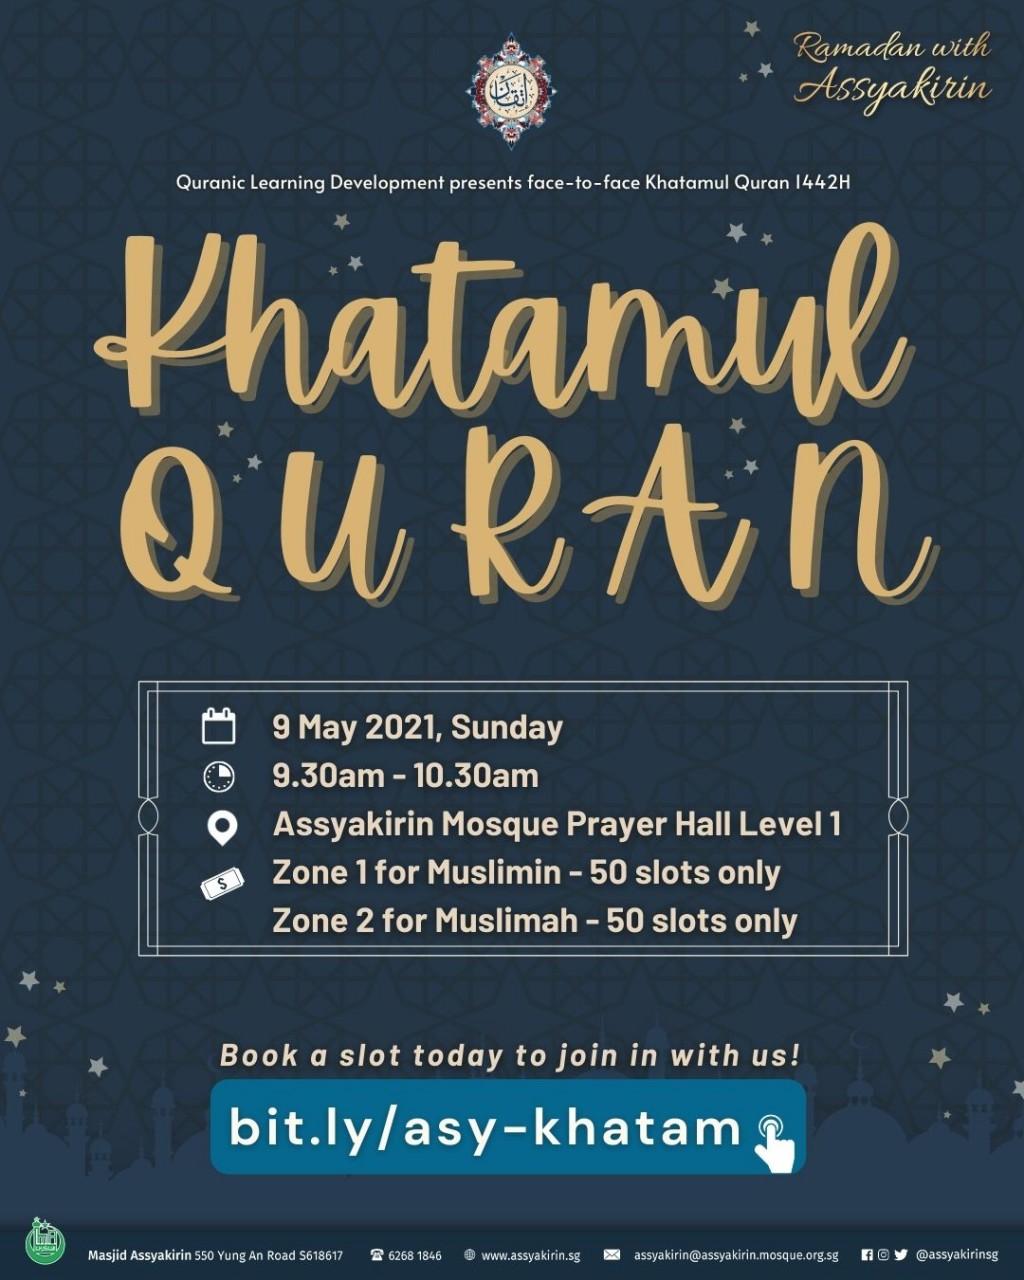 Khatamul Quran 1442H